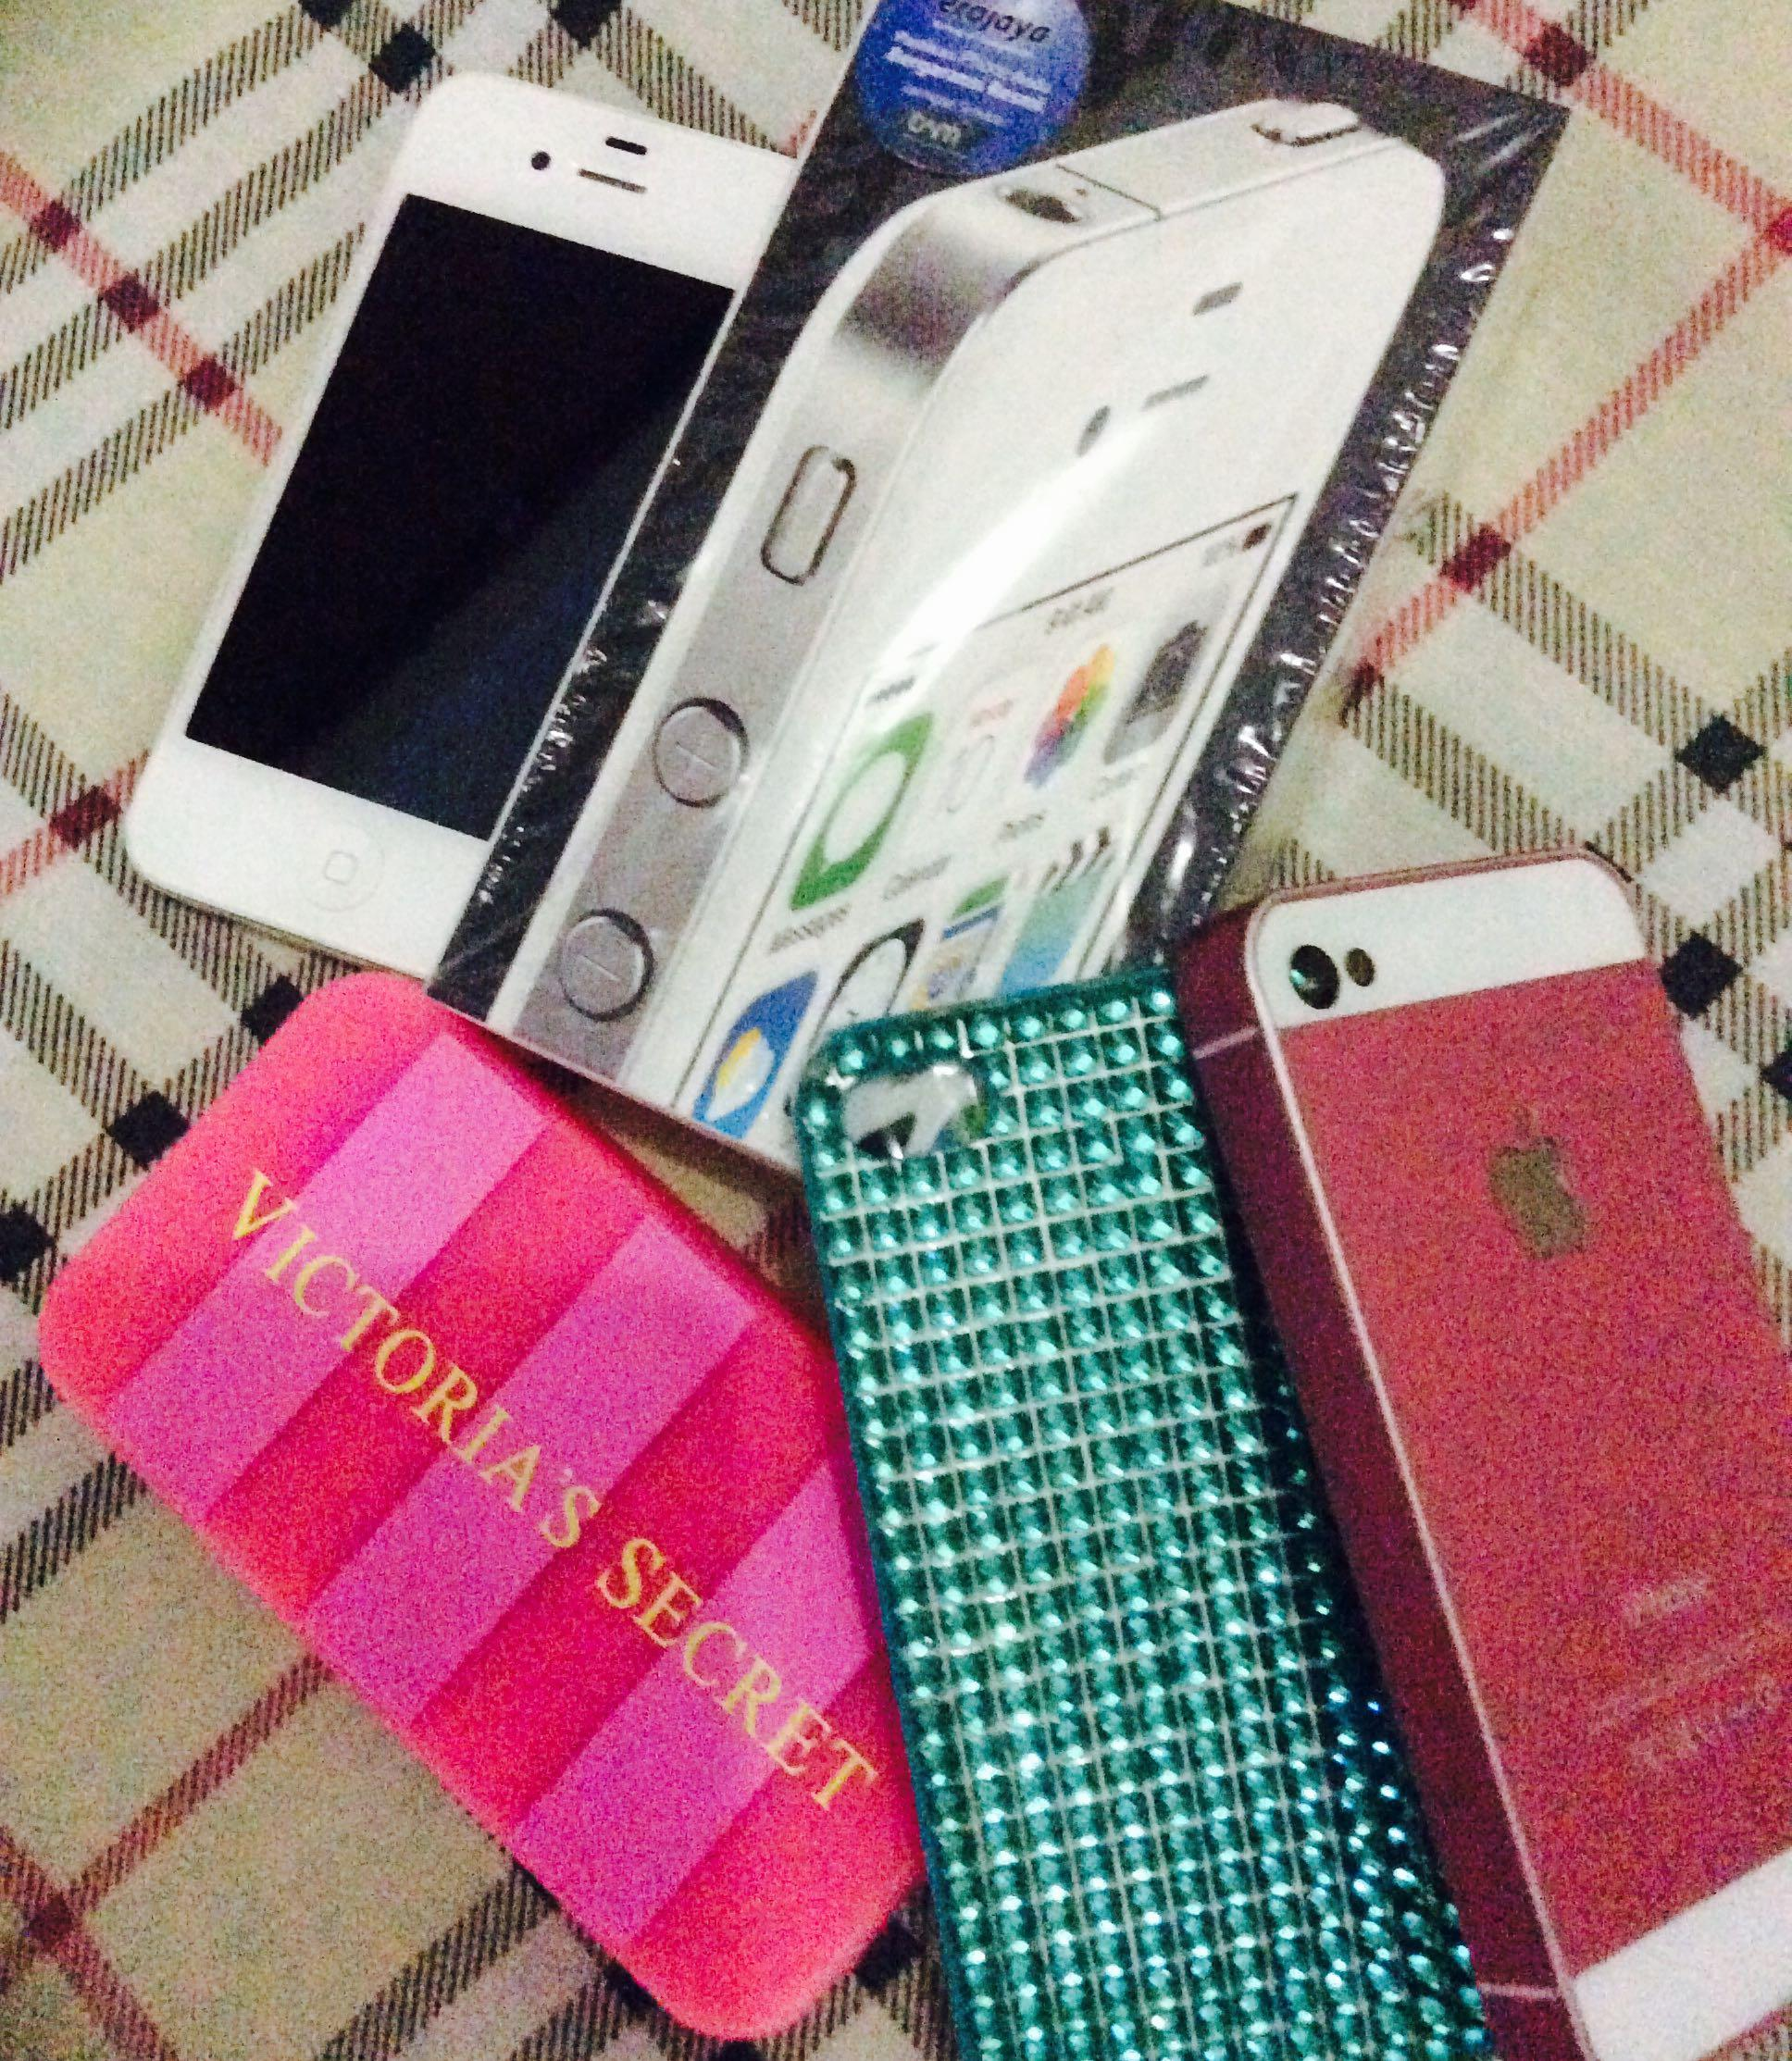 iPhone 4 & free cases